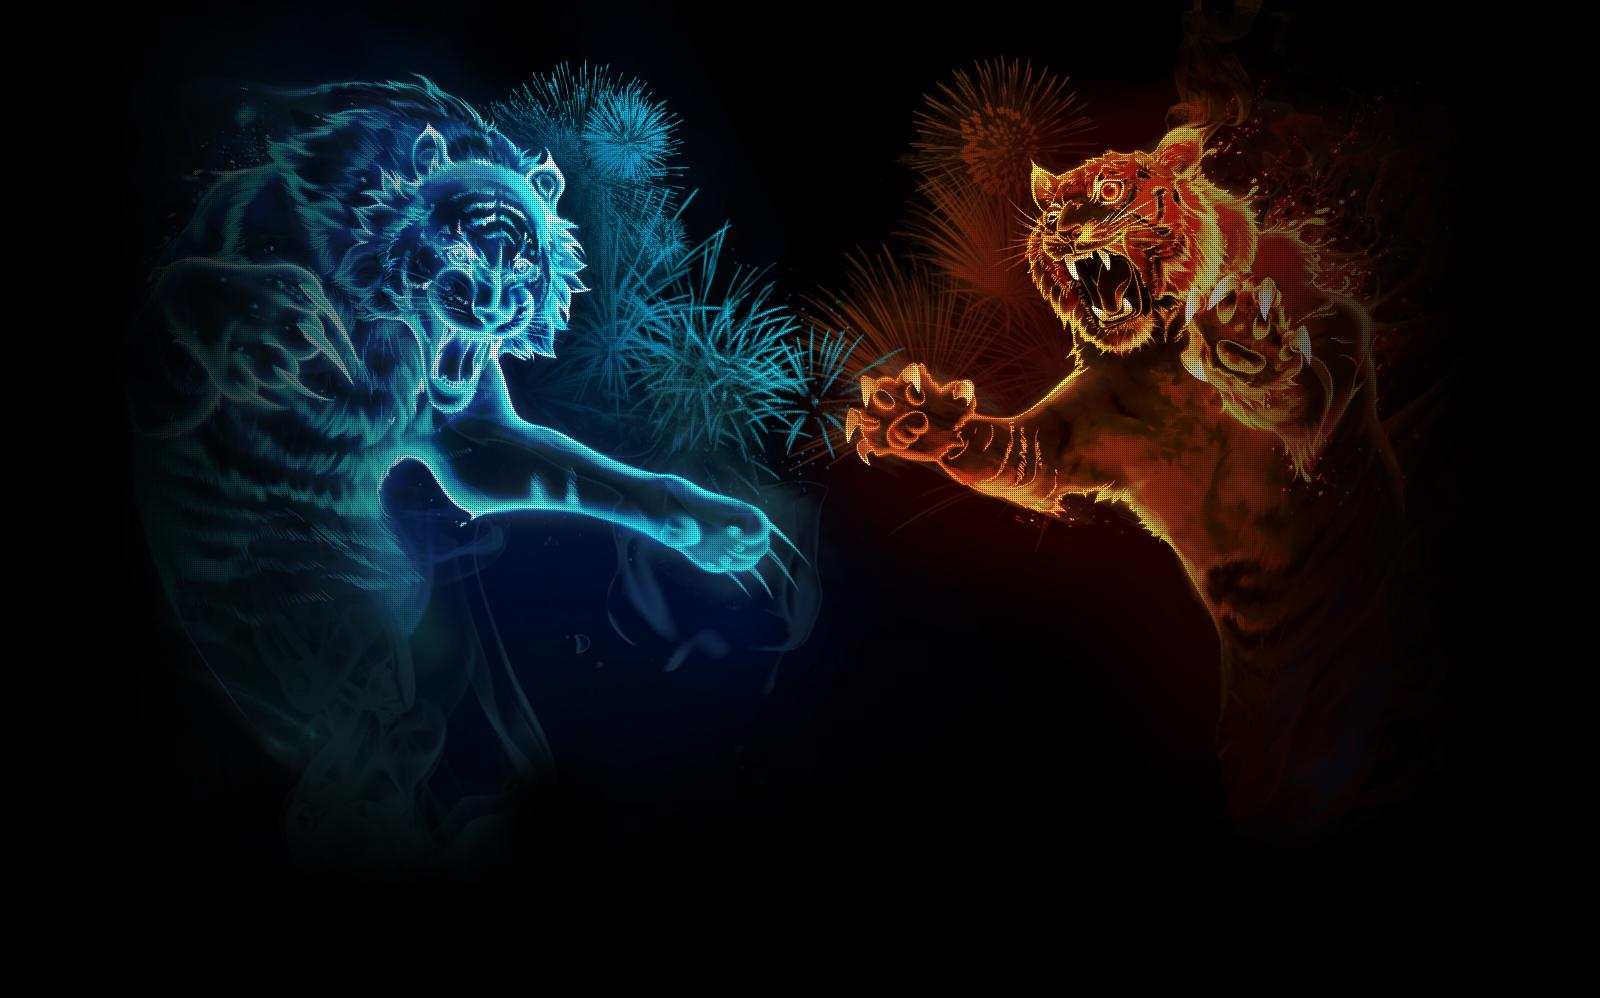 Tiger Computer Wallpapers Desktop Backgrounds 1600x998 ID247117 1600x998